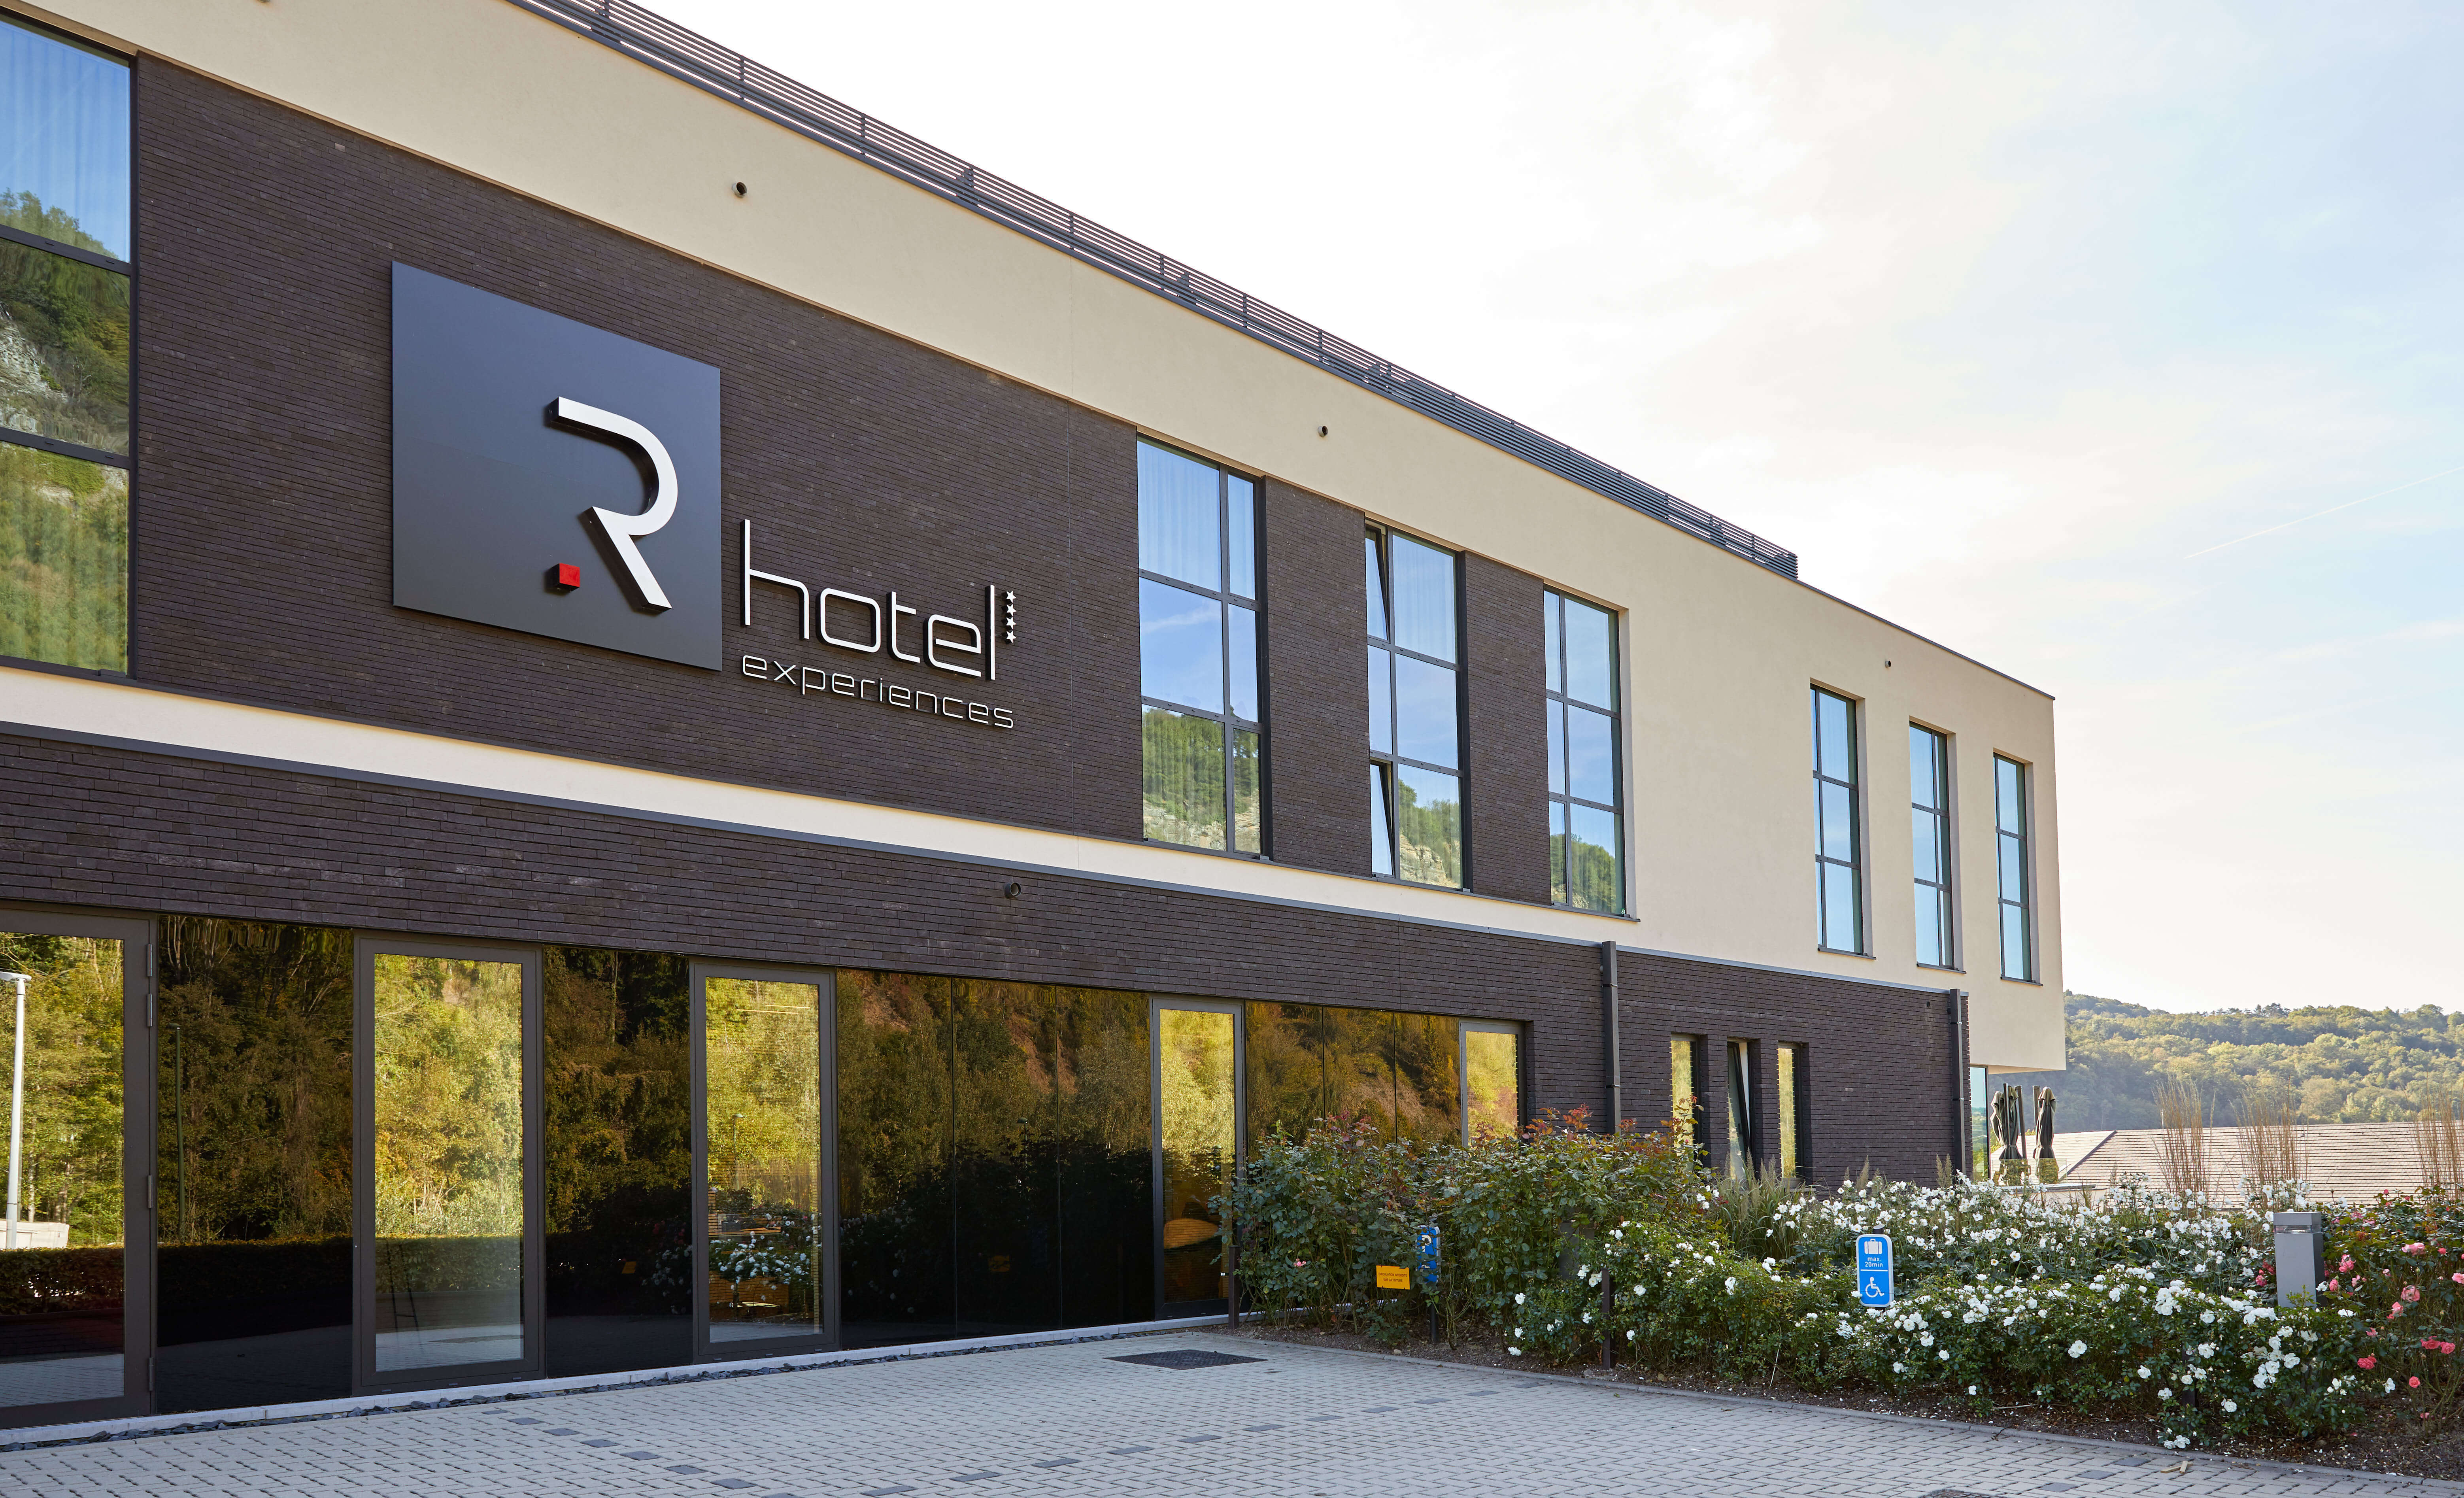 R Hotel Remouchamps Façades Knauf